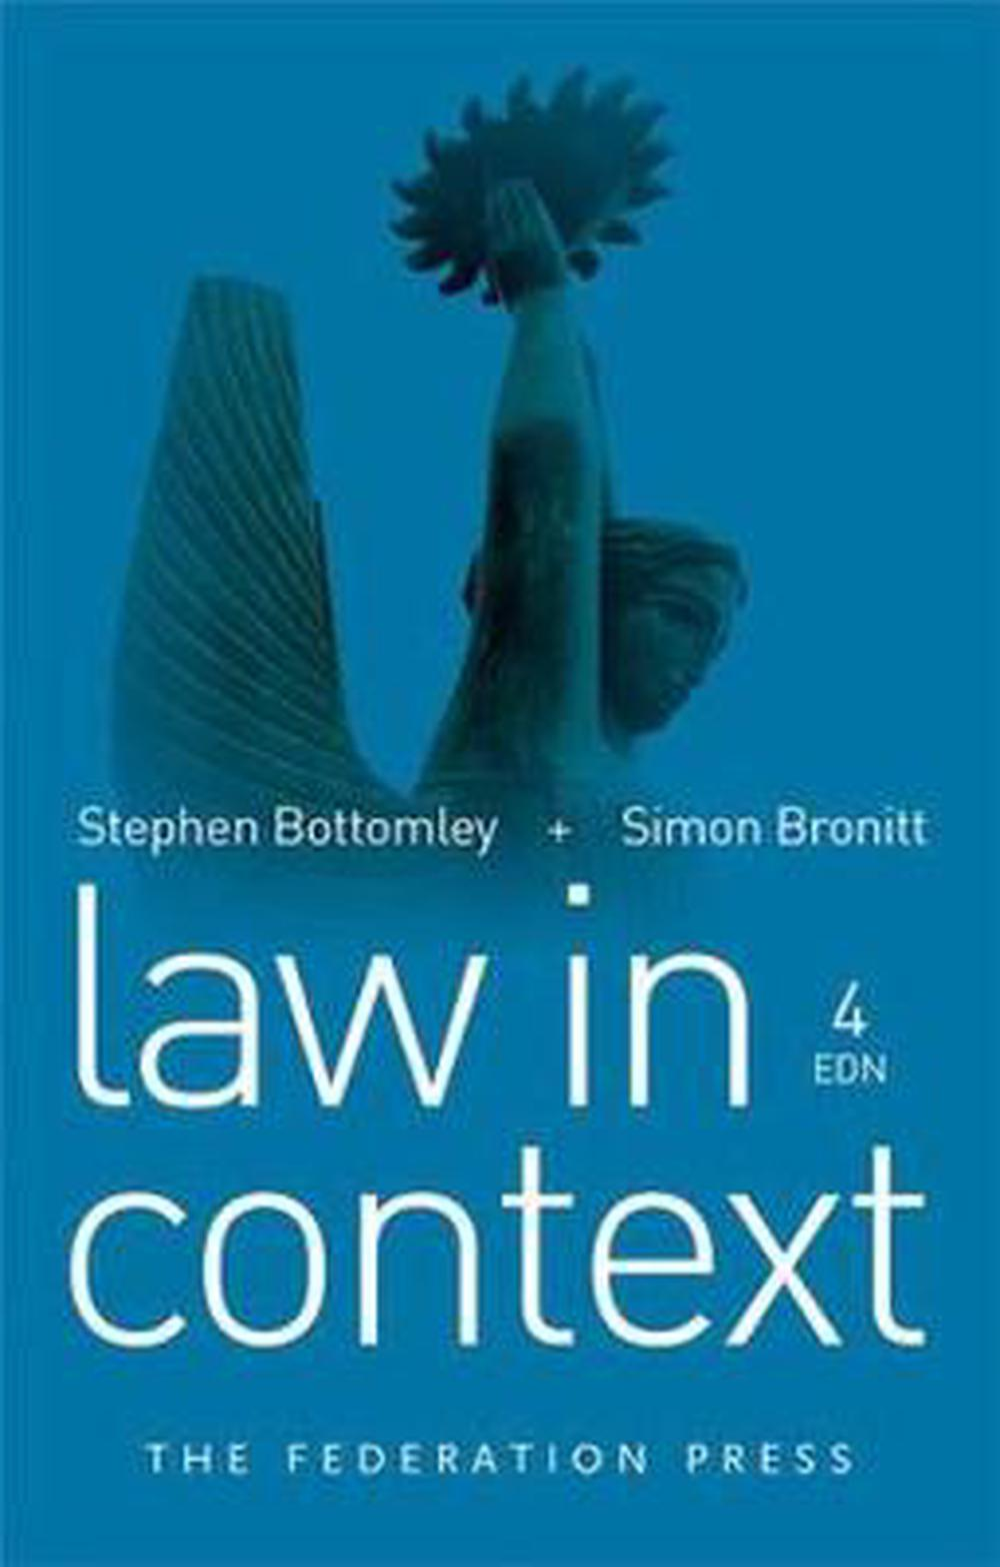 Law in context bottomley bronitt pdf